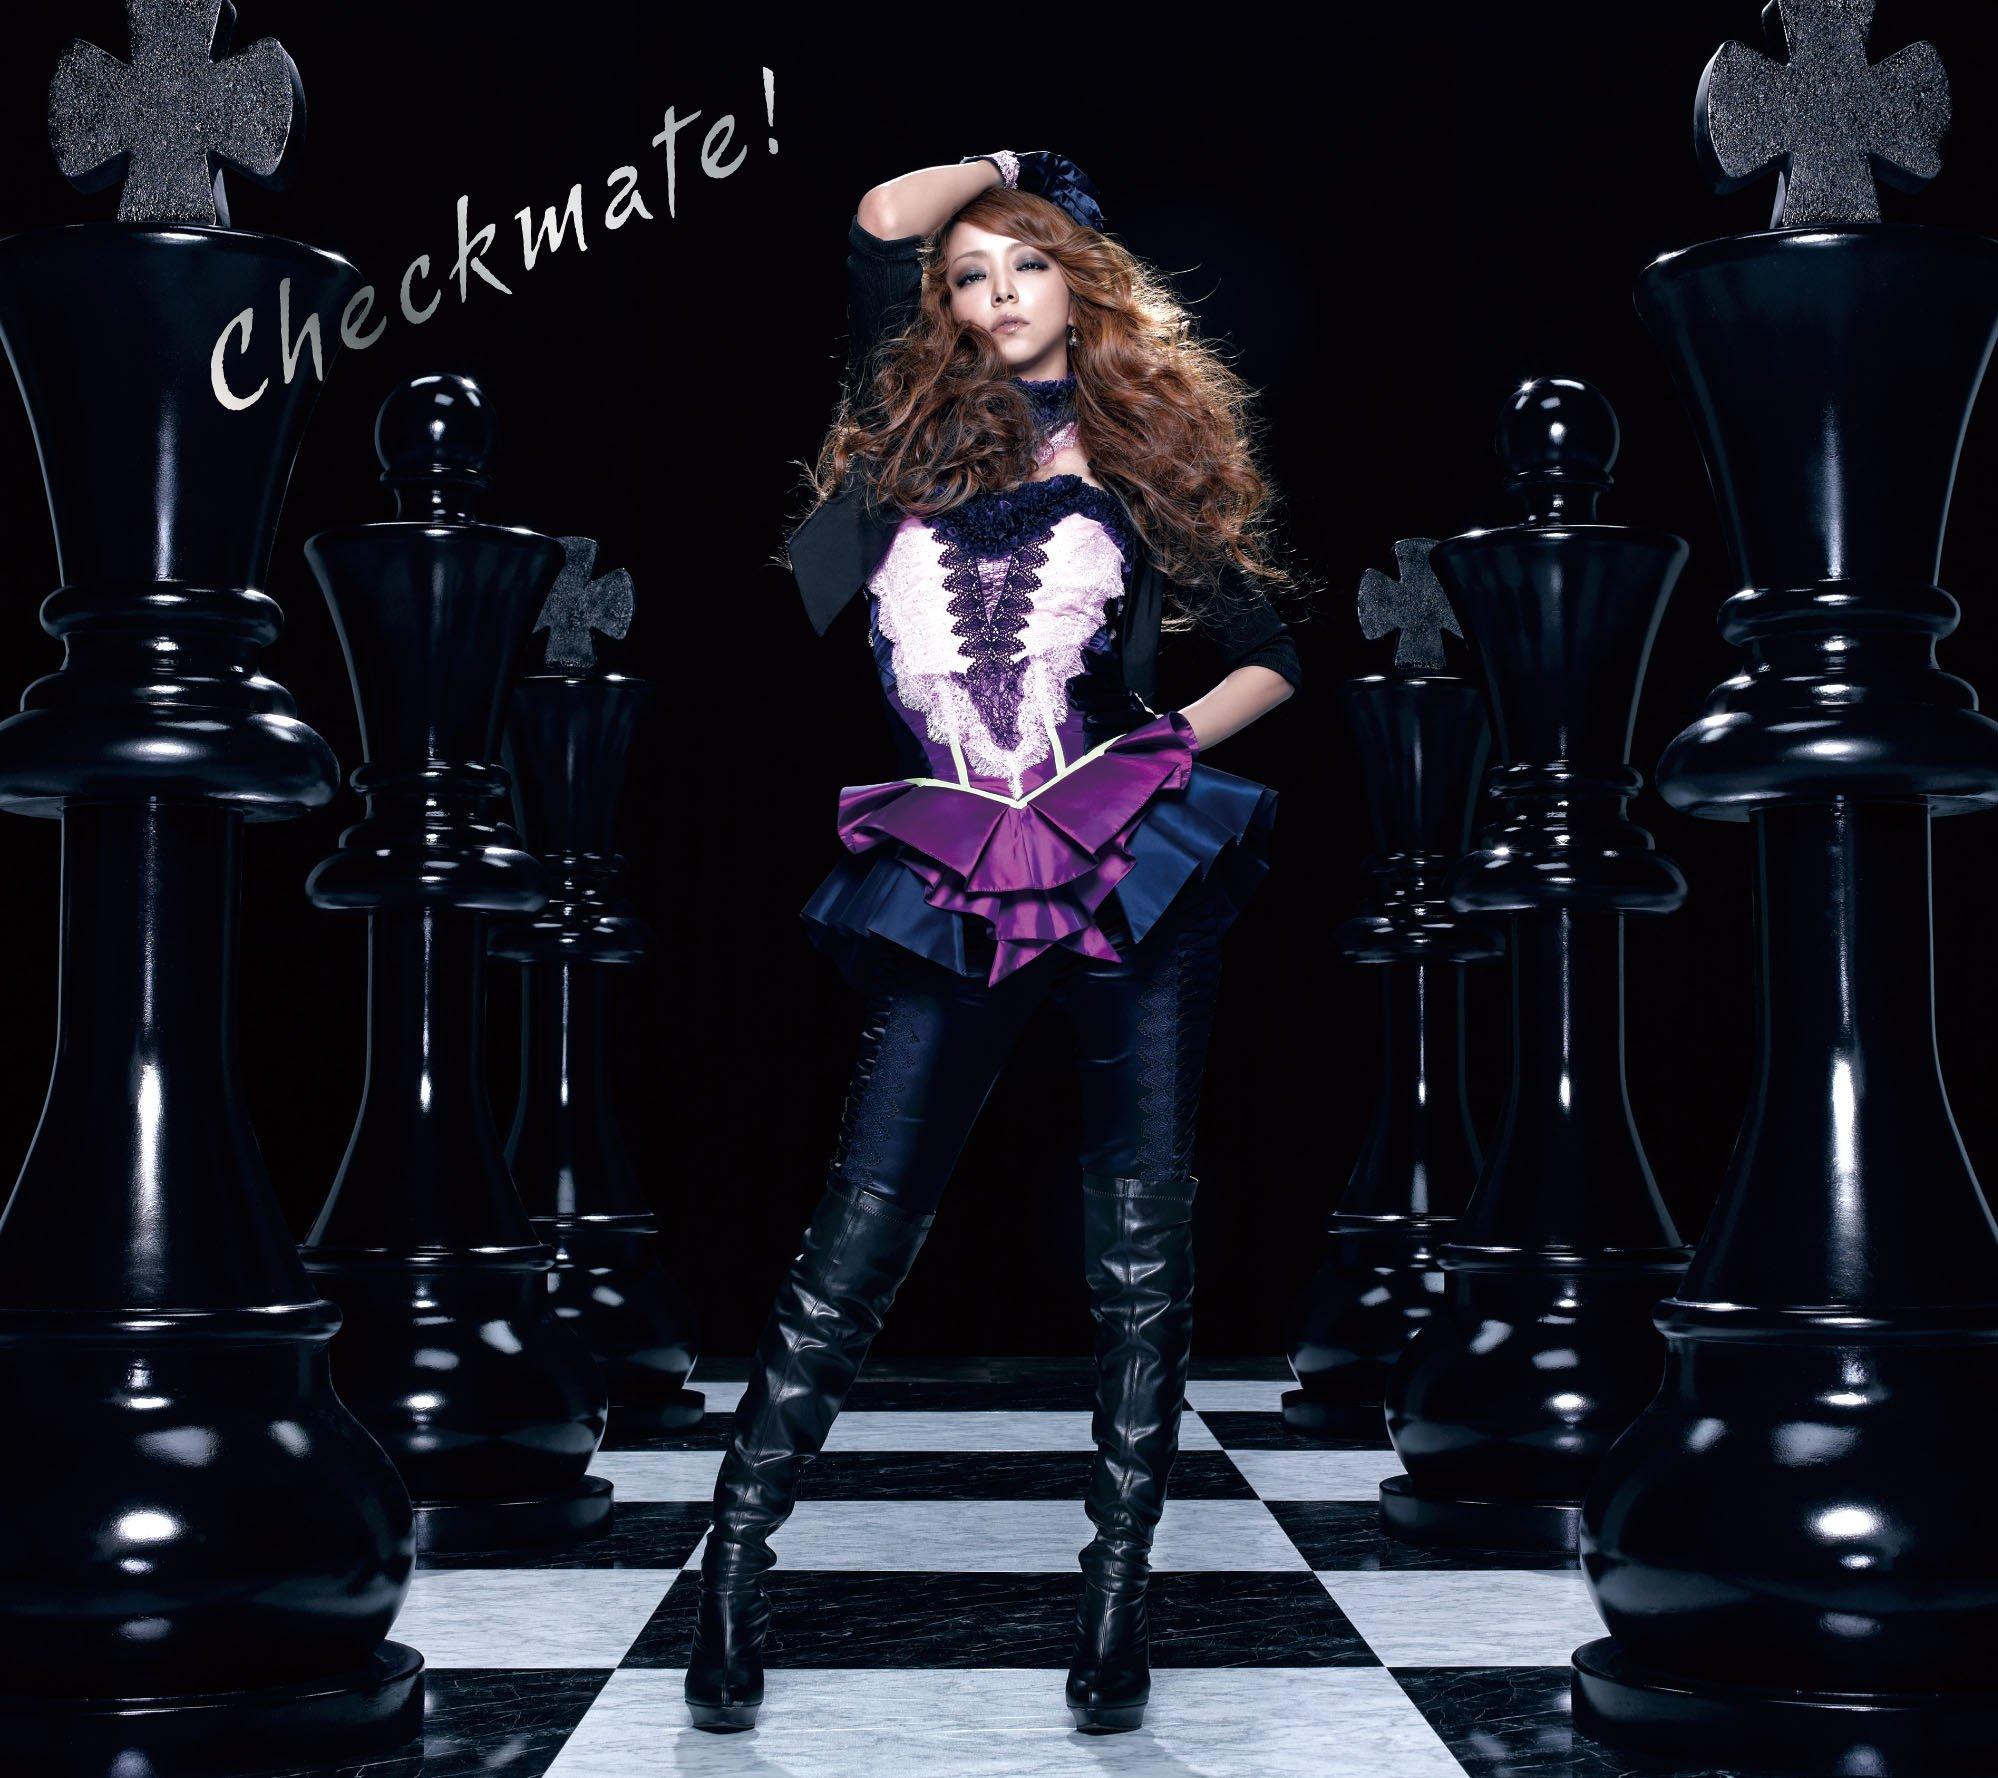 Amuro_Namie_-_Checkmate%21_CD.jpg